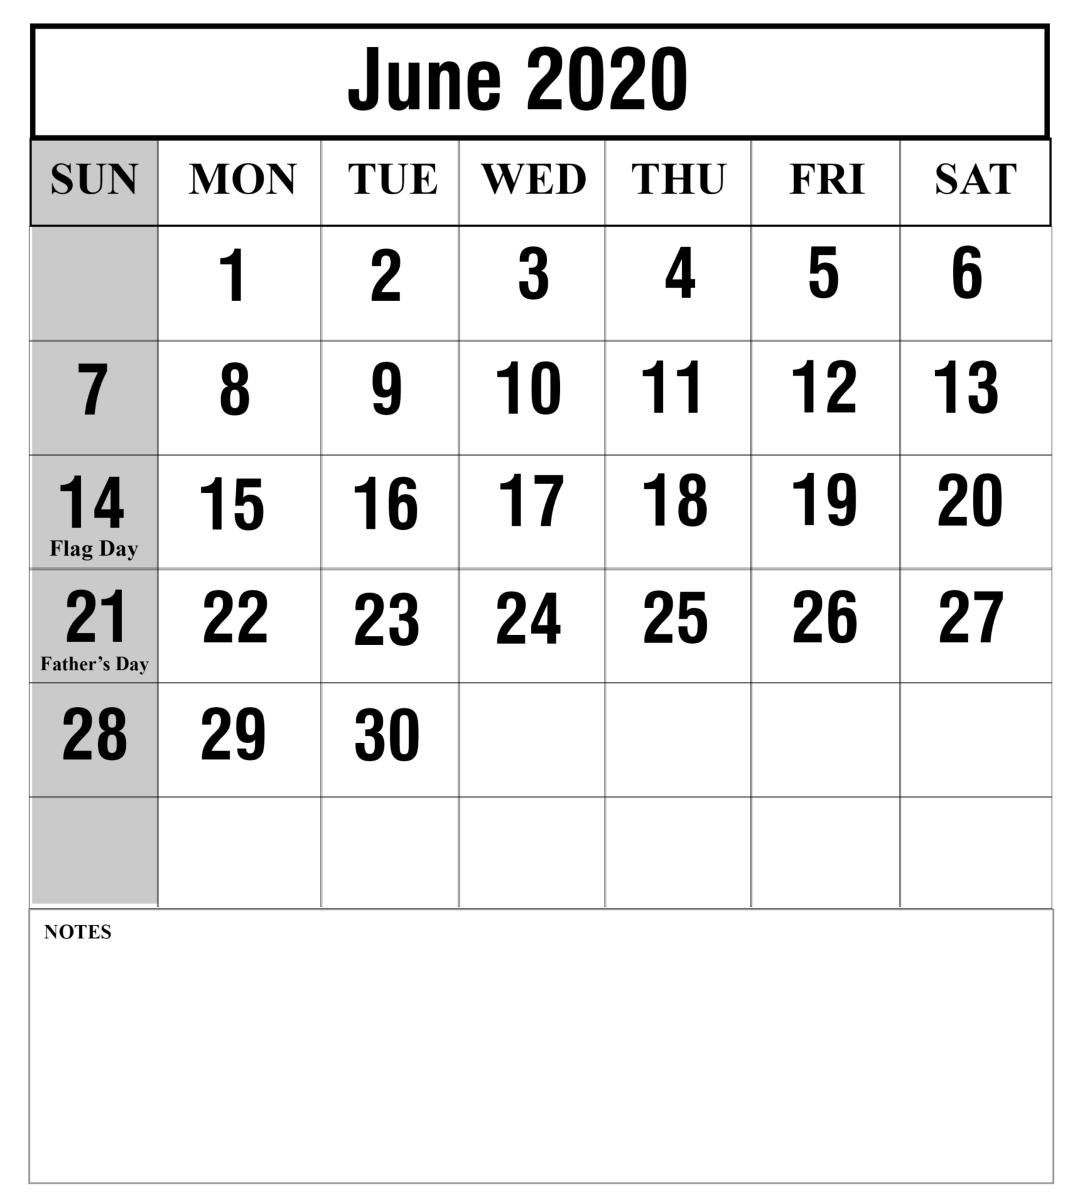 June 2020 Calendar With Holidays Printable